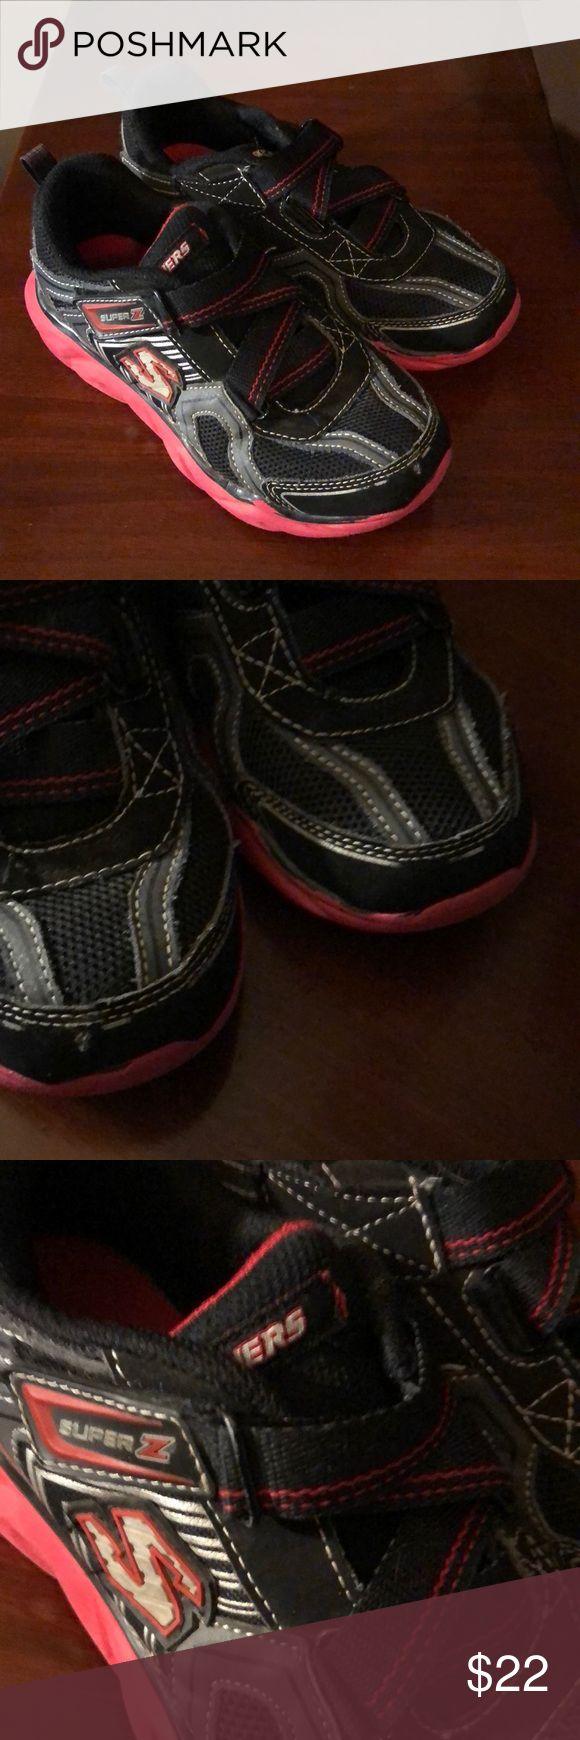 Sketchers sneakers GUC sketchers Shoes Sneakers